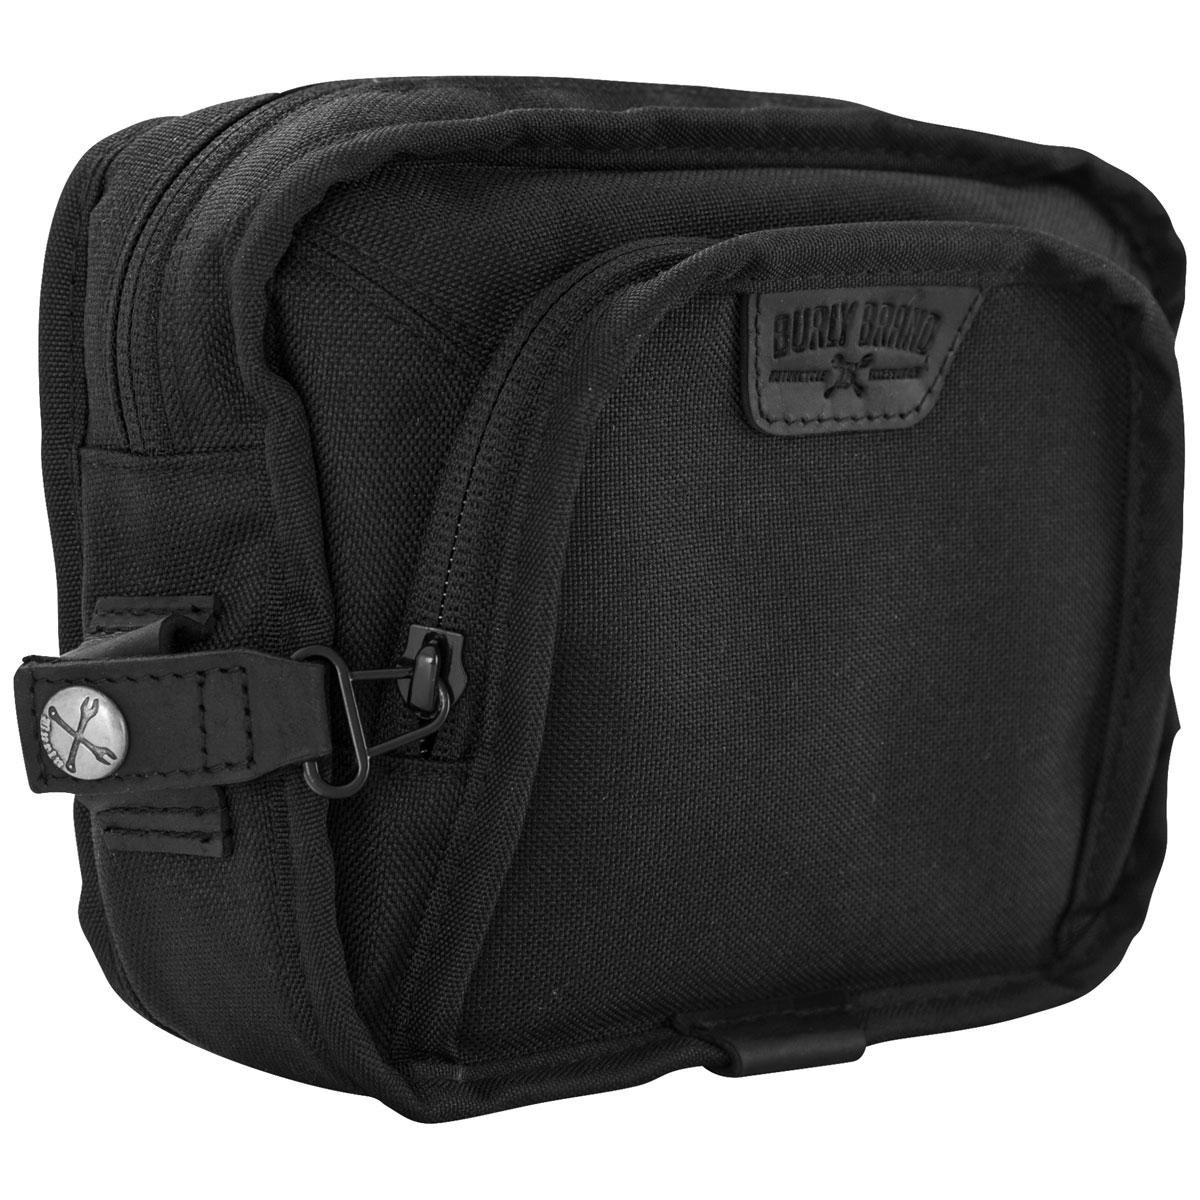 Burly Brand Voyager Black Handlebar Bag